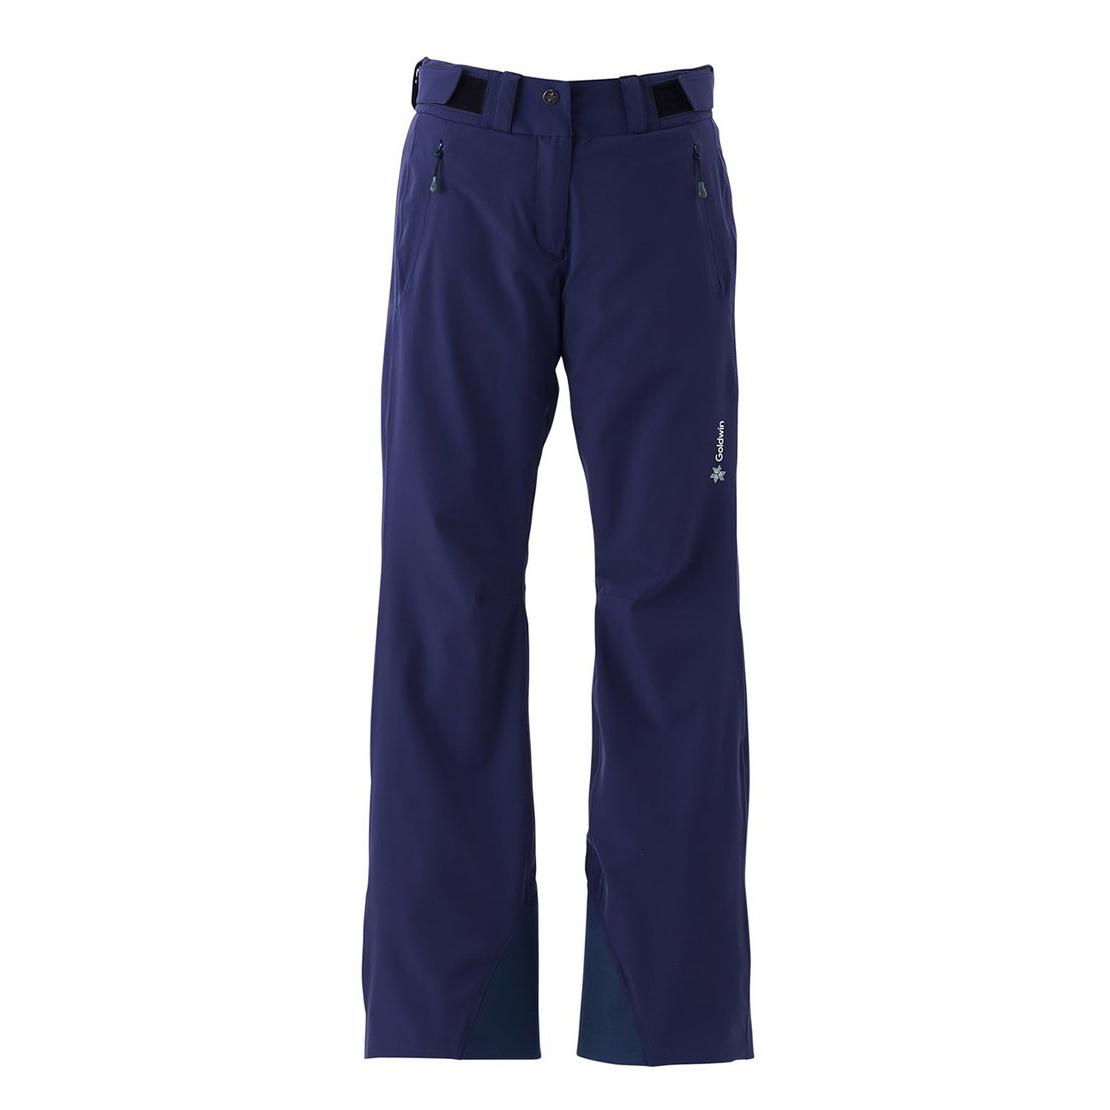 Prezzi Goldwin pantaloni albireo donna